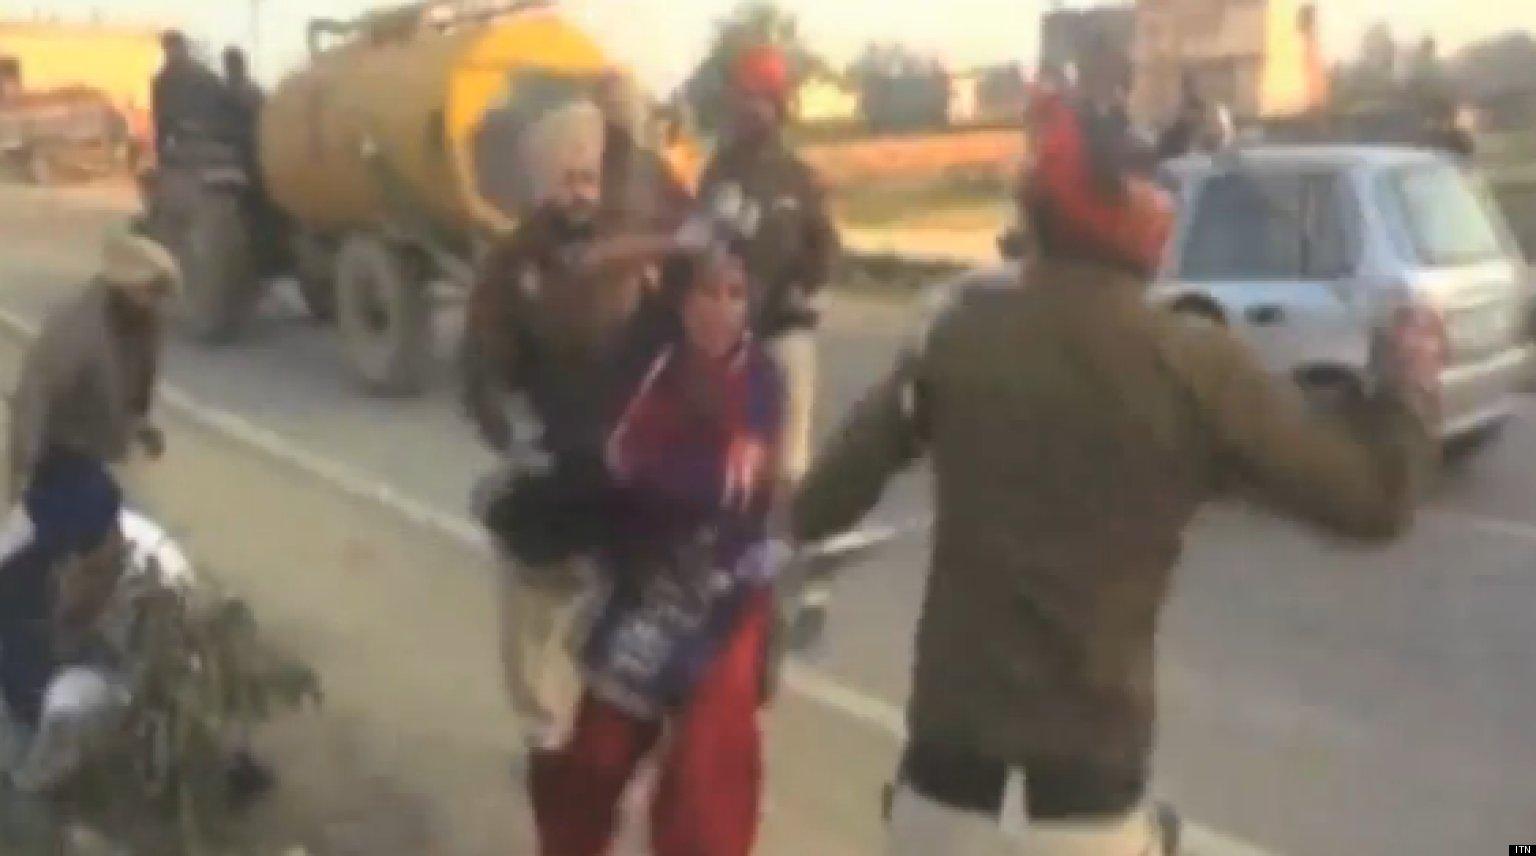 Harbinder Kaur Indian Woman Beaten By Police In Tarn Taran Sparking Outrage VIDEO  HuffPost